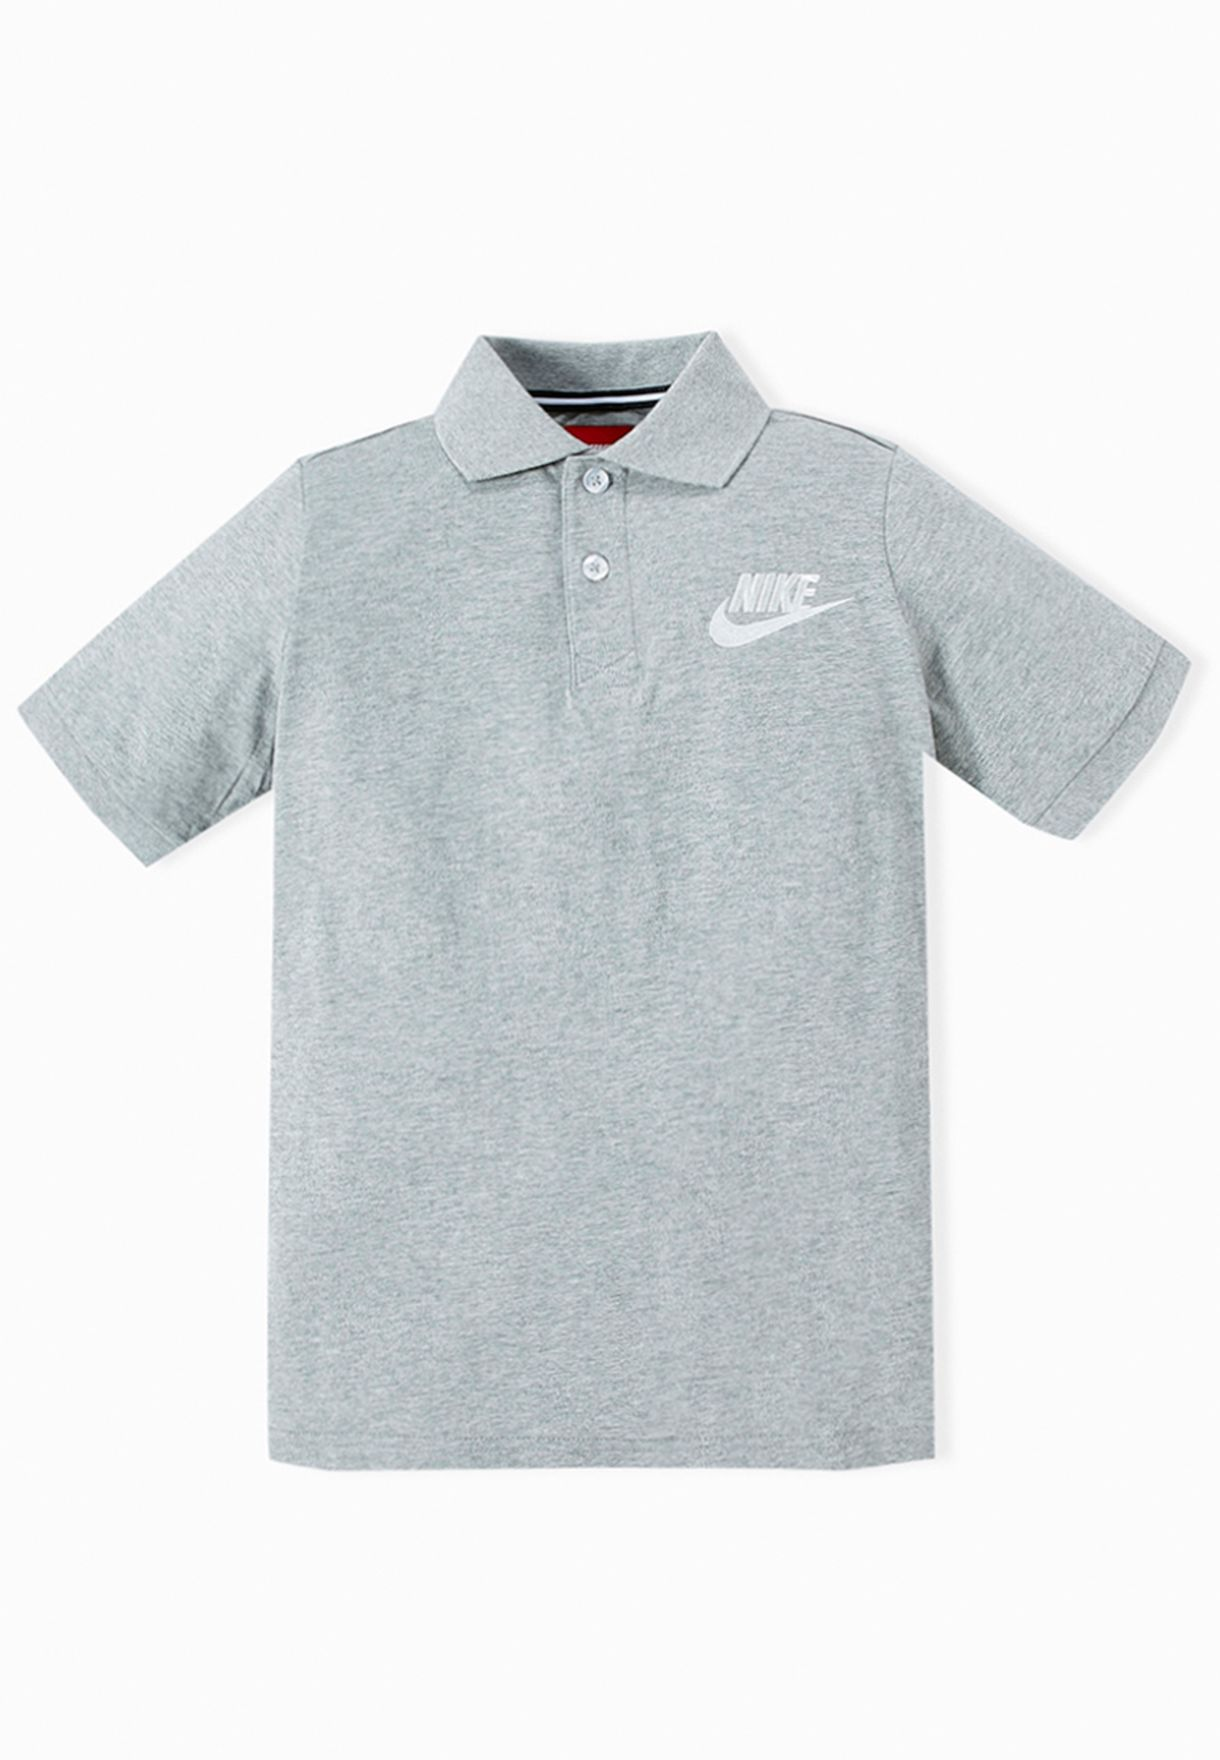 Nike Franchise Polo Shirt Junior - BCD Tofu House a0ddda836